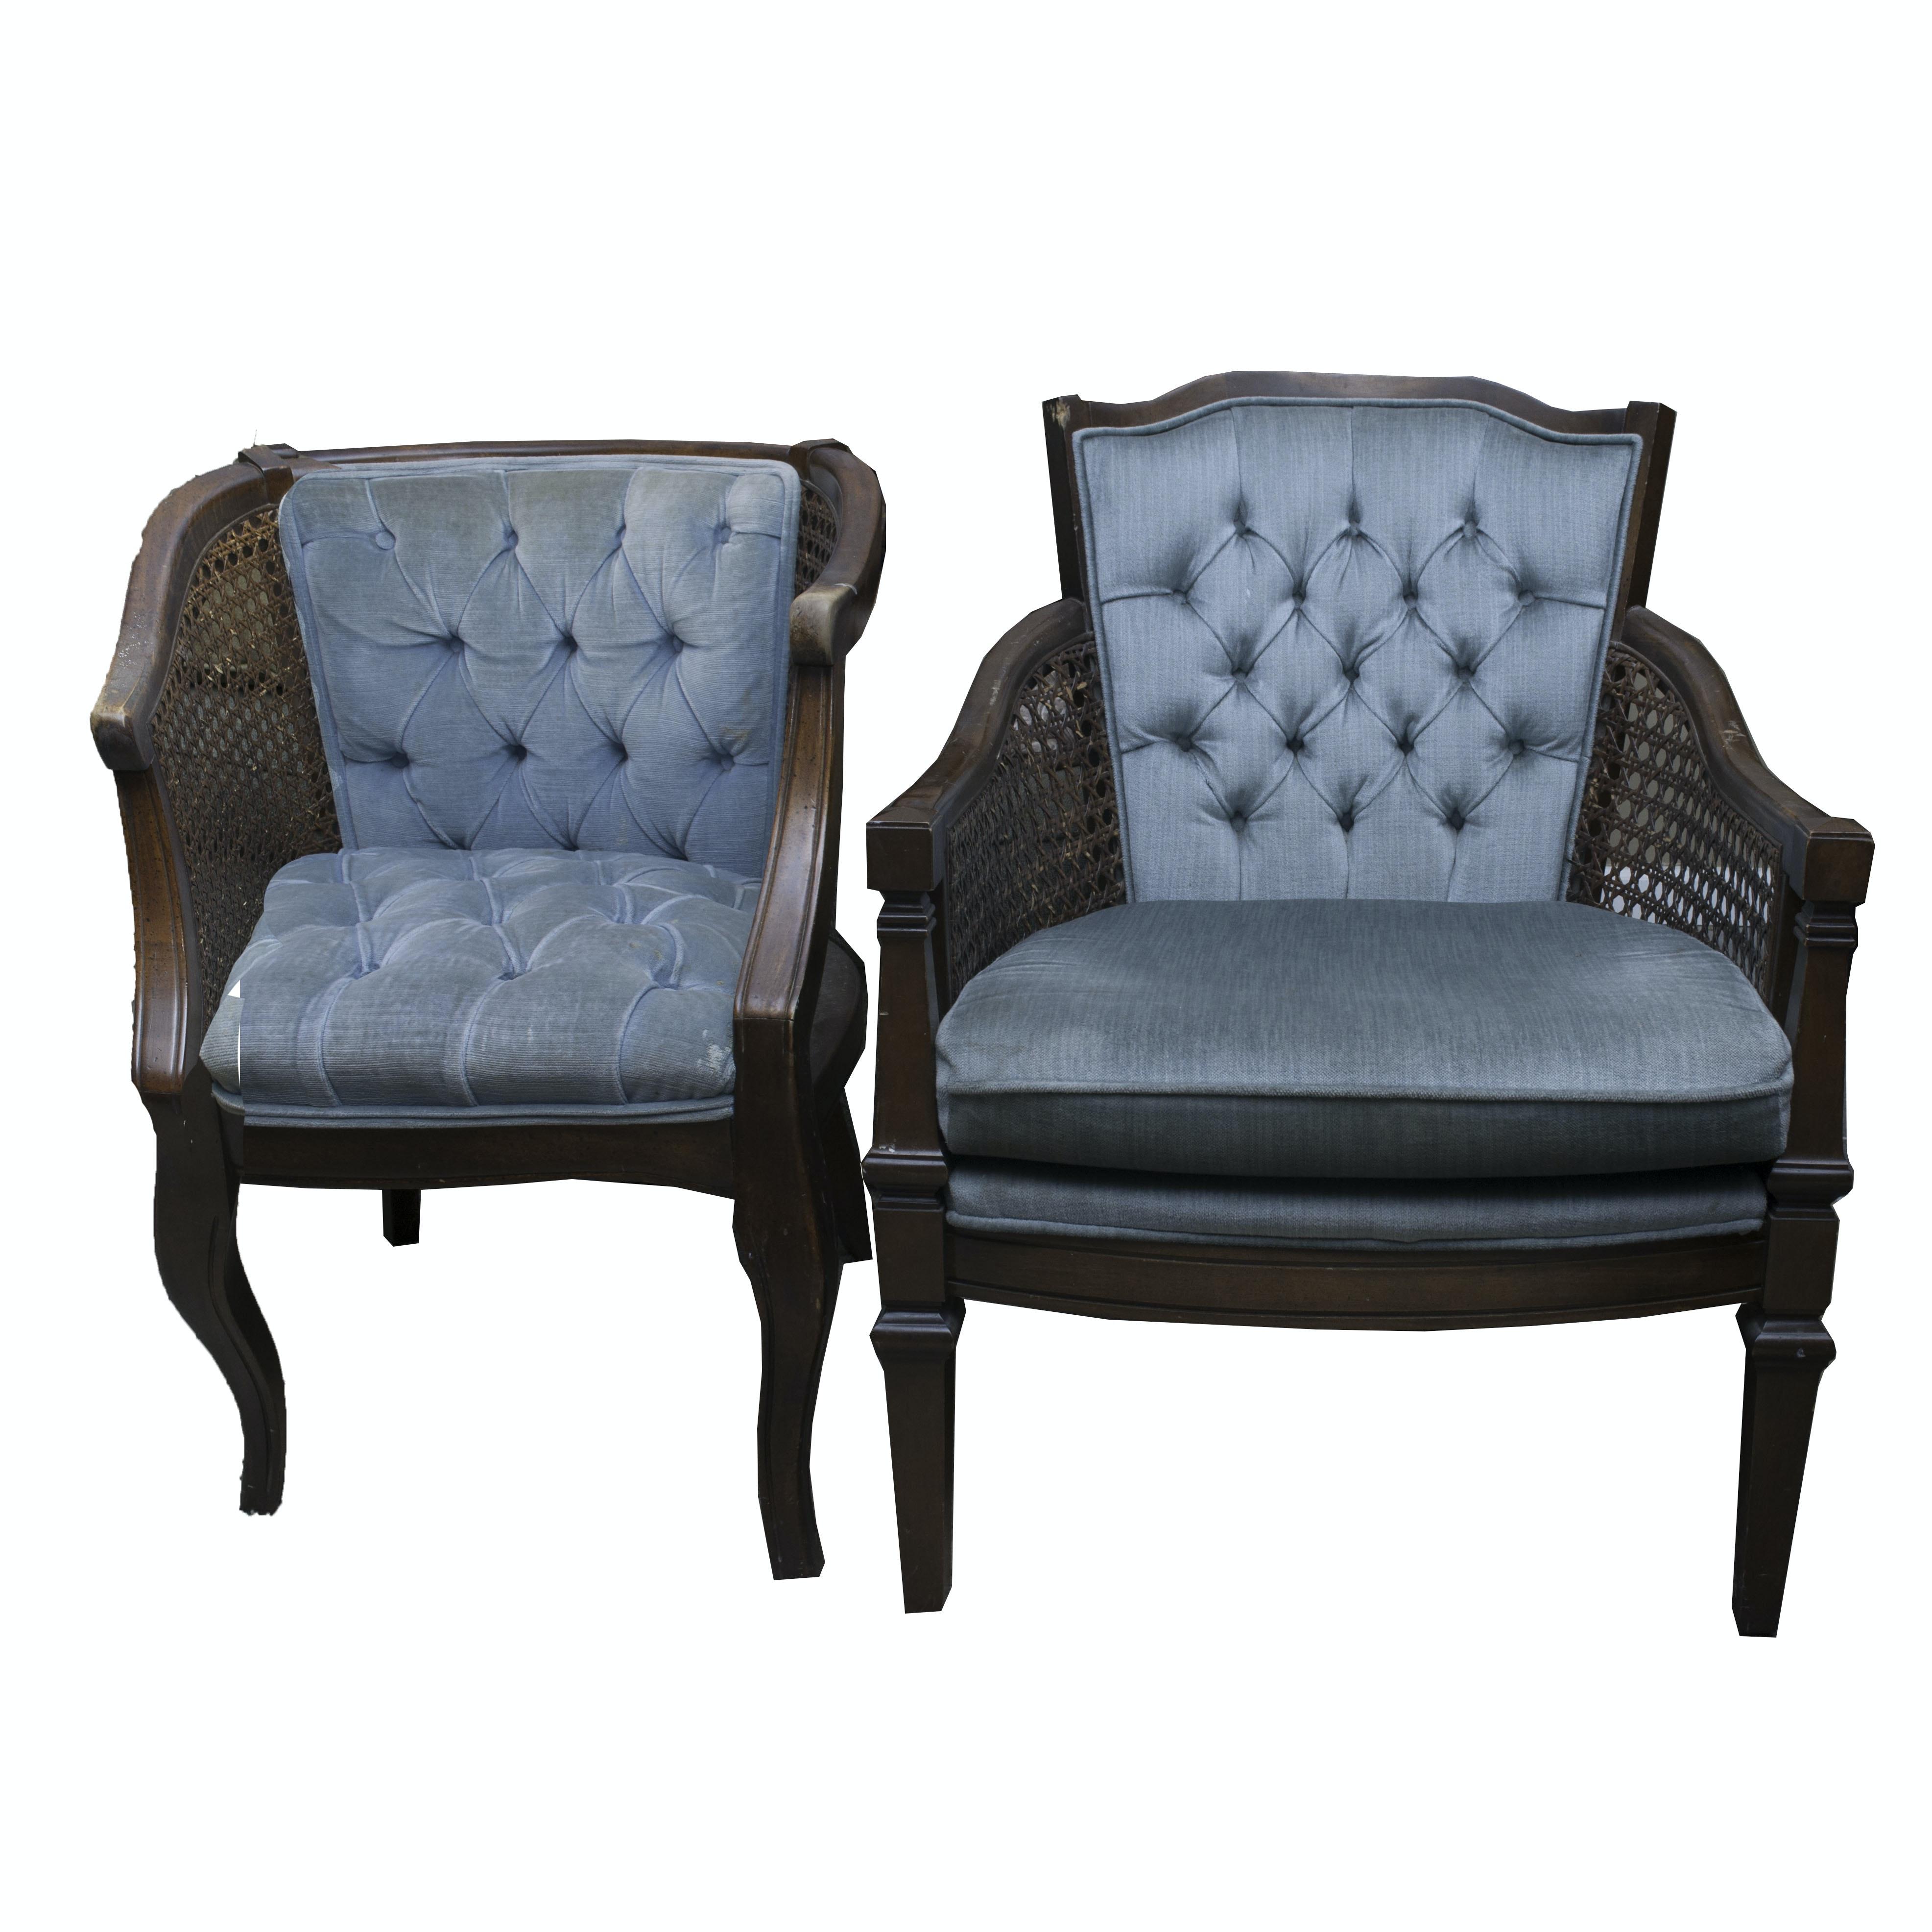 Vintage Chairs By Kincaid Chair Company Ebth